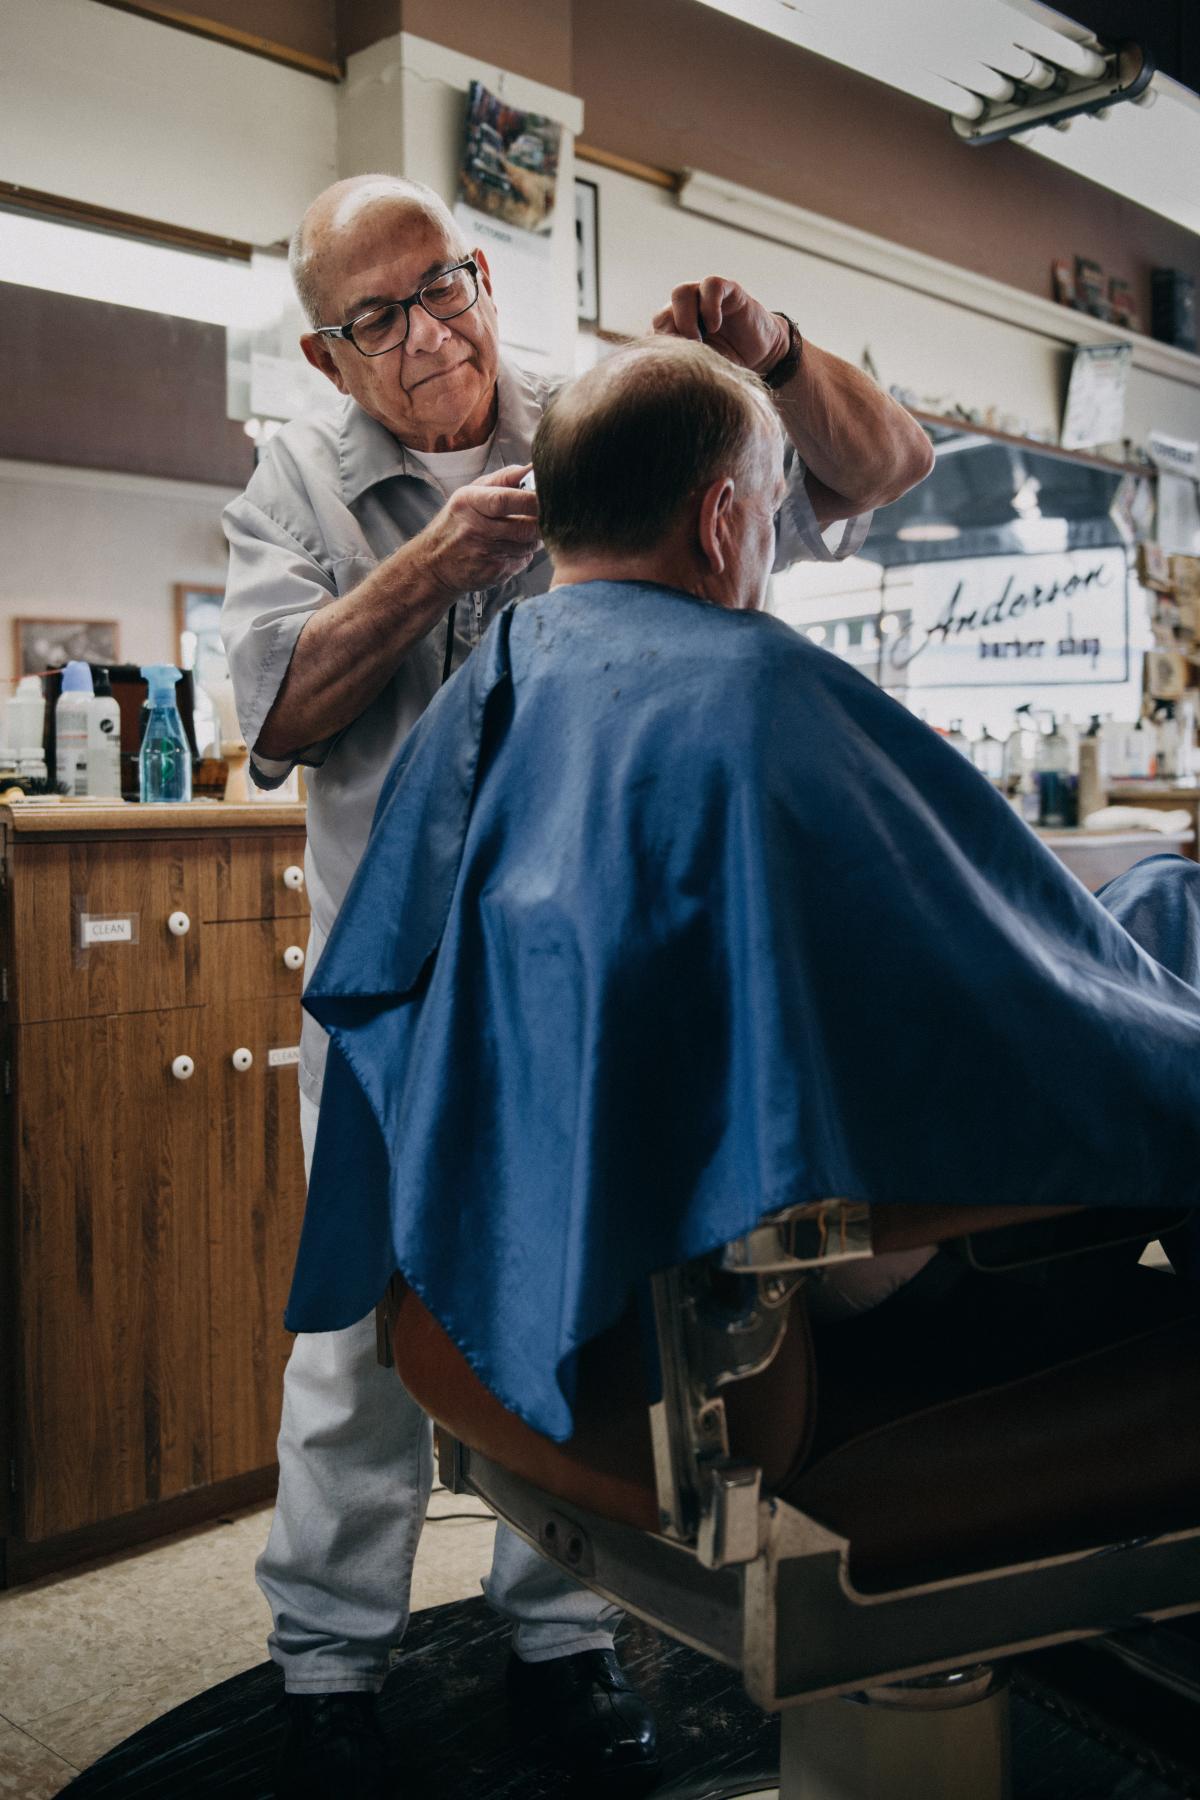 Barber chair Hairdresser Barbershop #423287